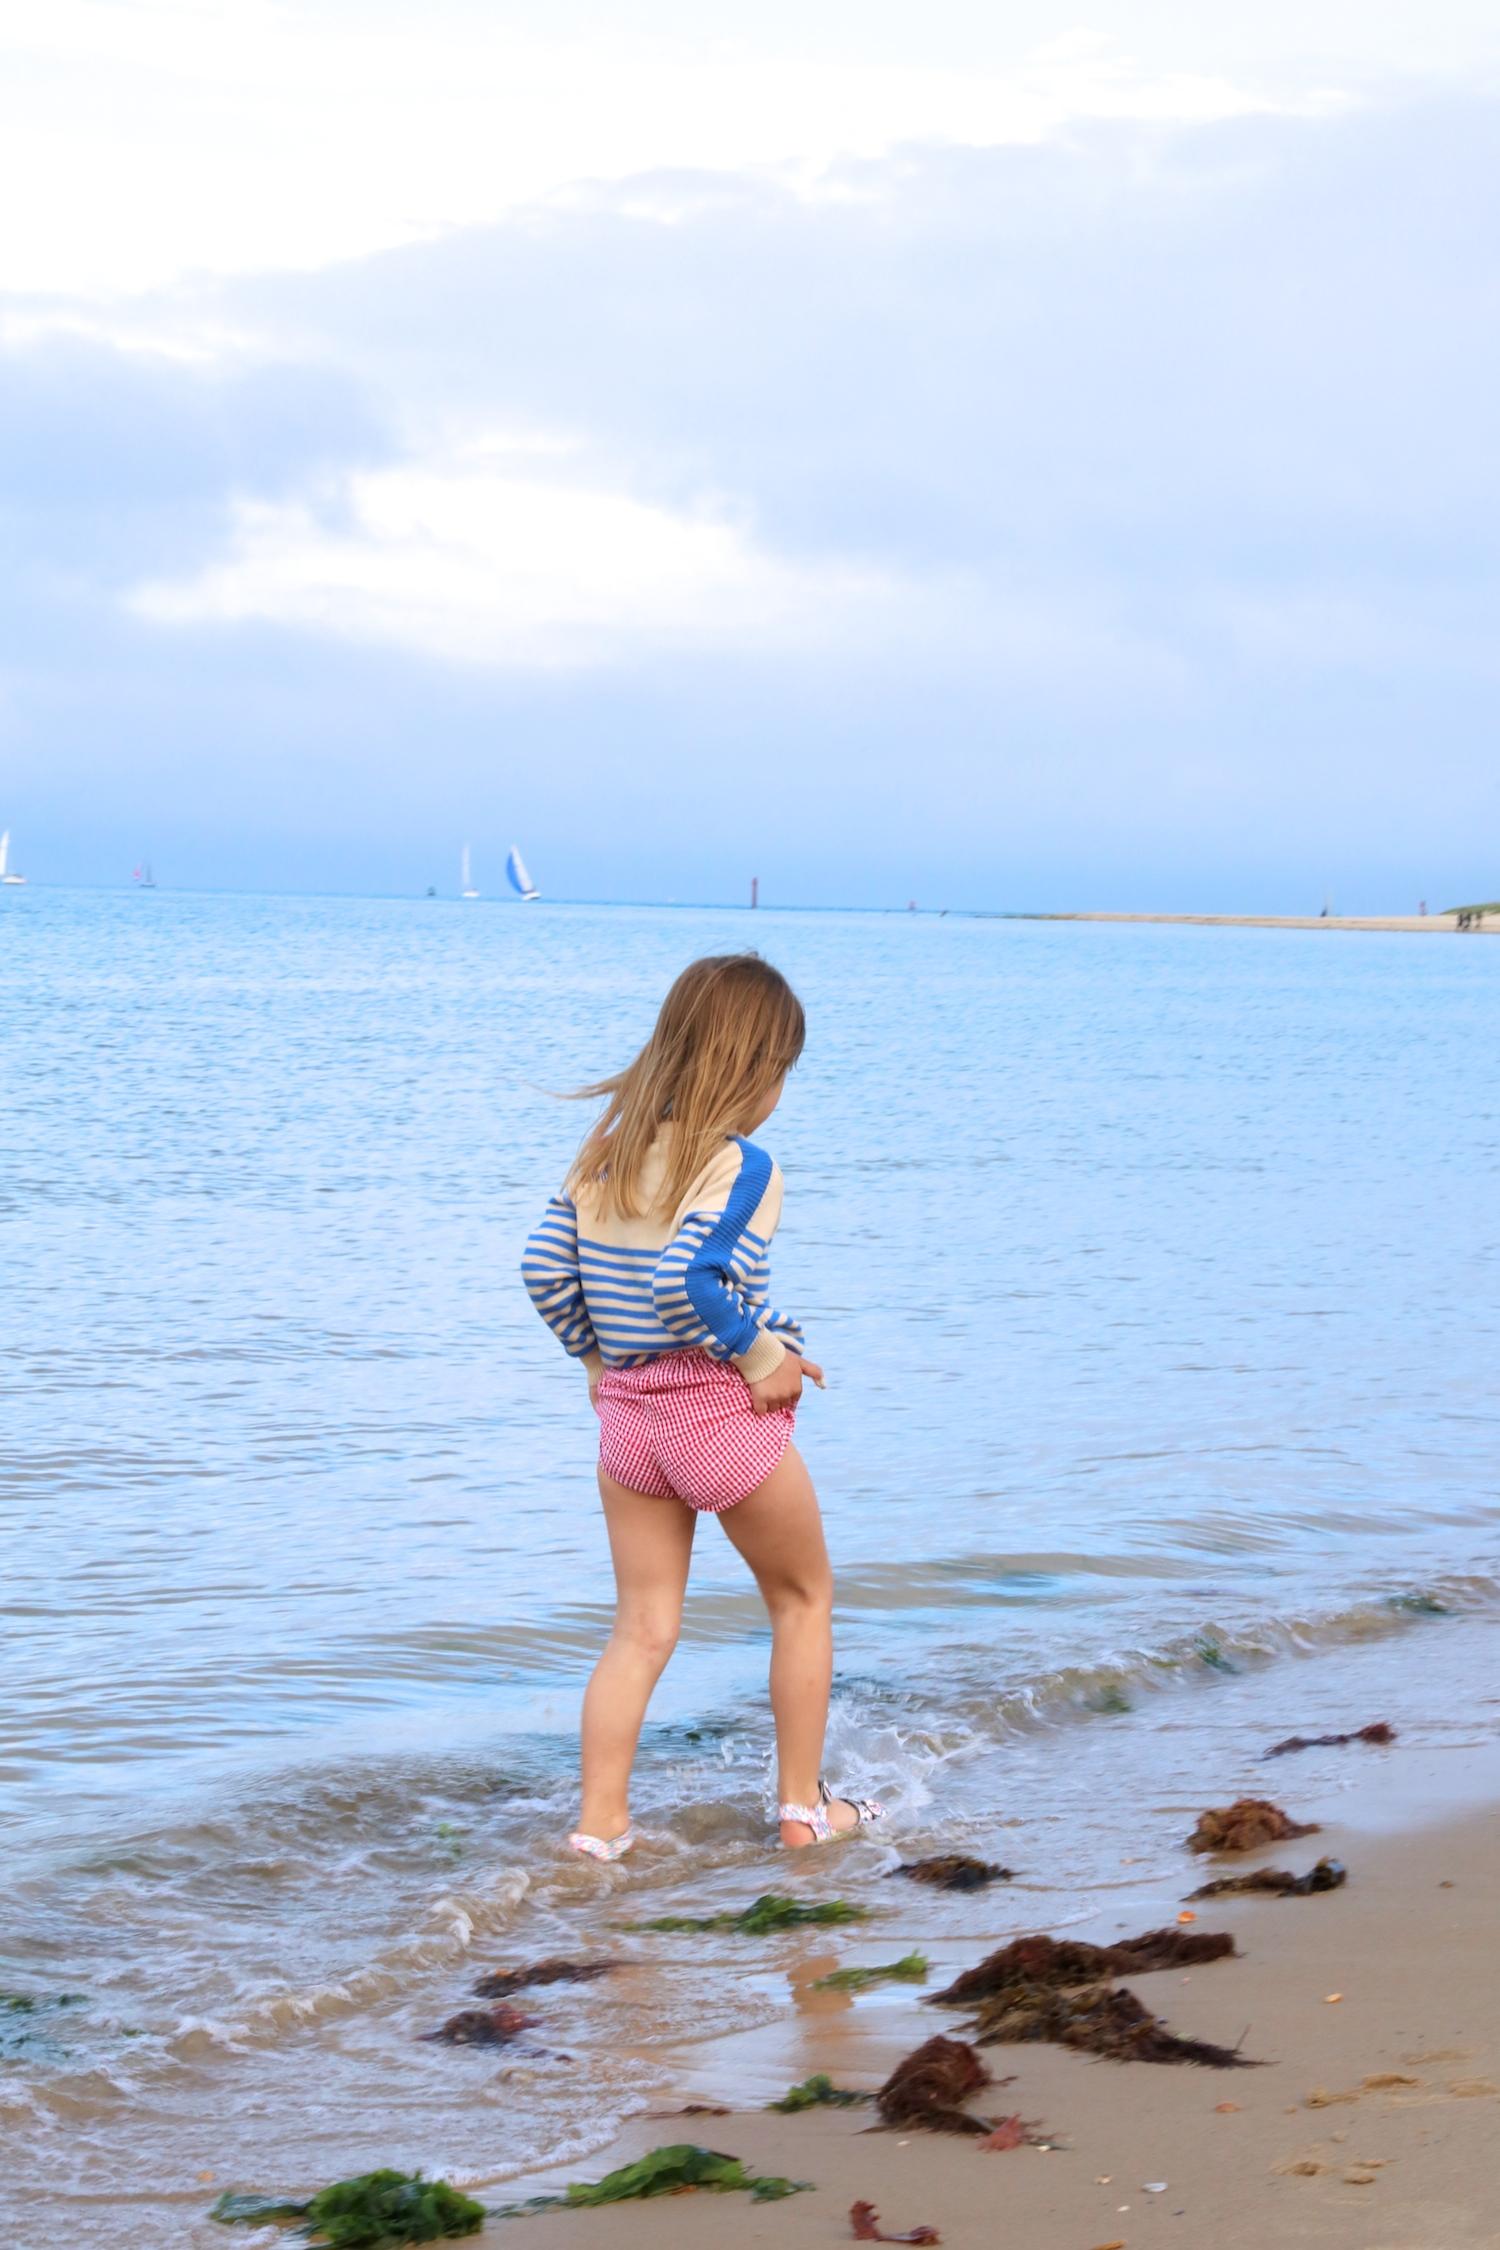 Tootsa_macginty_shorts_jumper